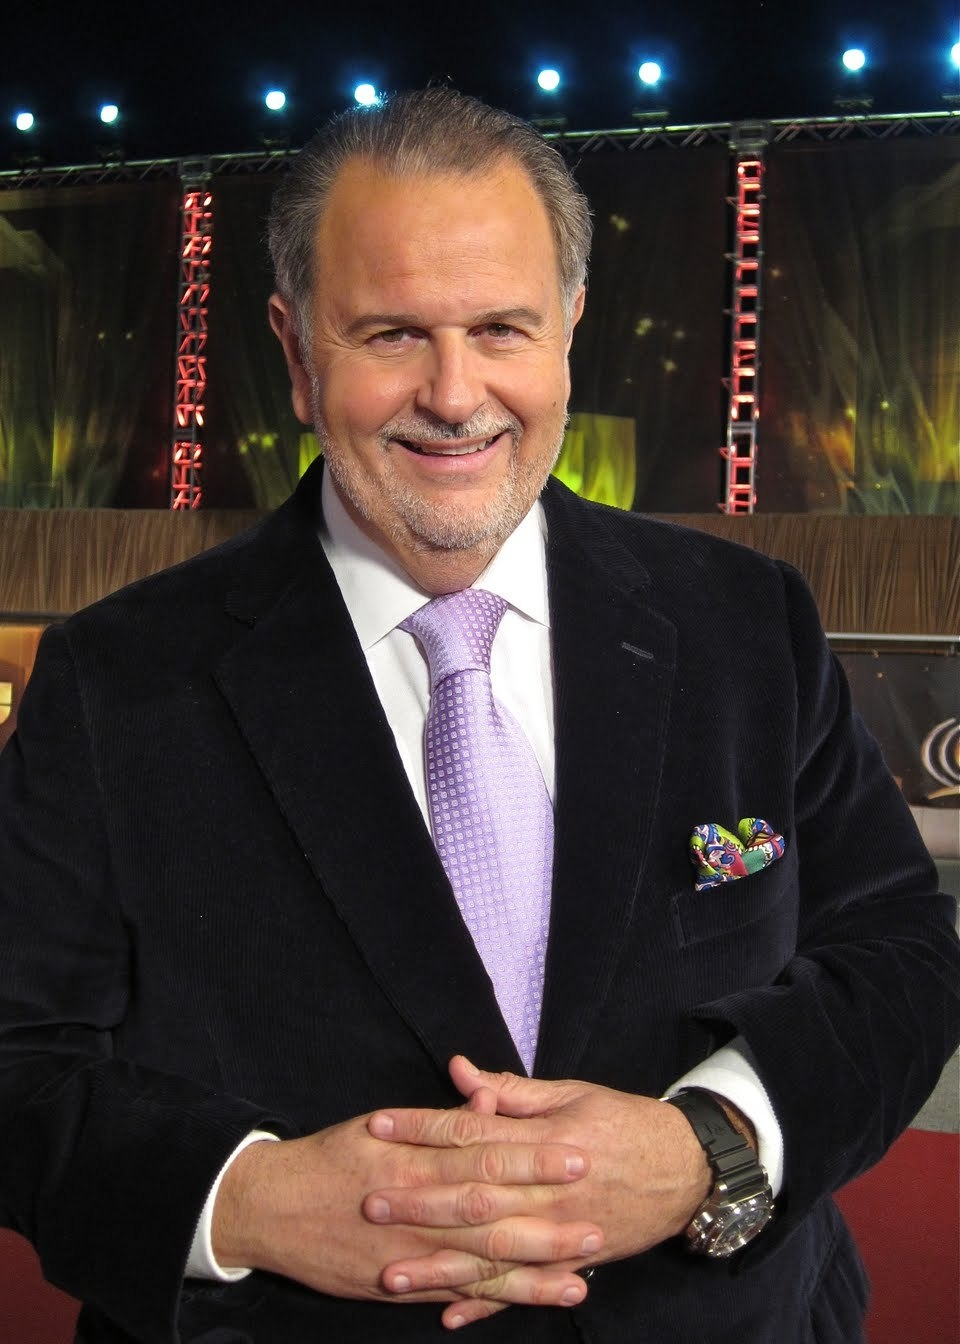 Raul De Molina Net Worth